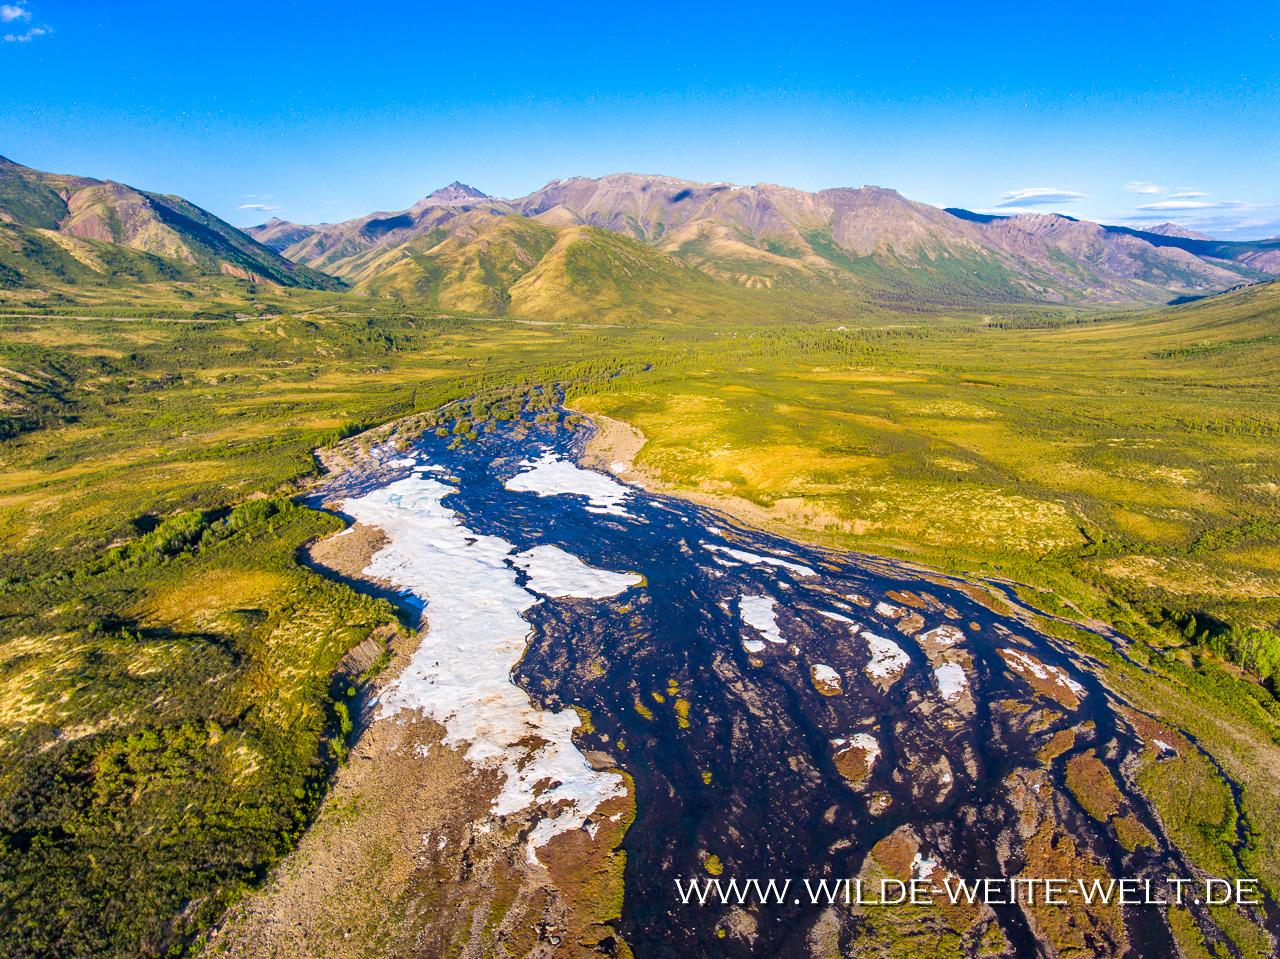 Tombstone-Mountains-und-North-Klondike-River-Tombstone-Territorial-Park-Dempster-HIghway-Yukon-7 Dempster Highway nach Tuktoyaktuk: Landschaften / Landscapes [Dempster]